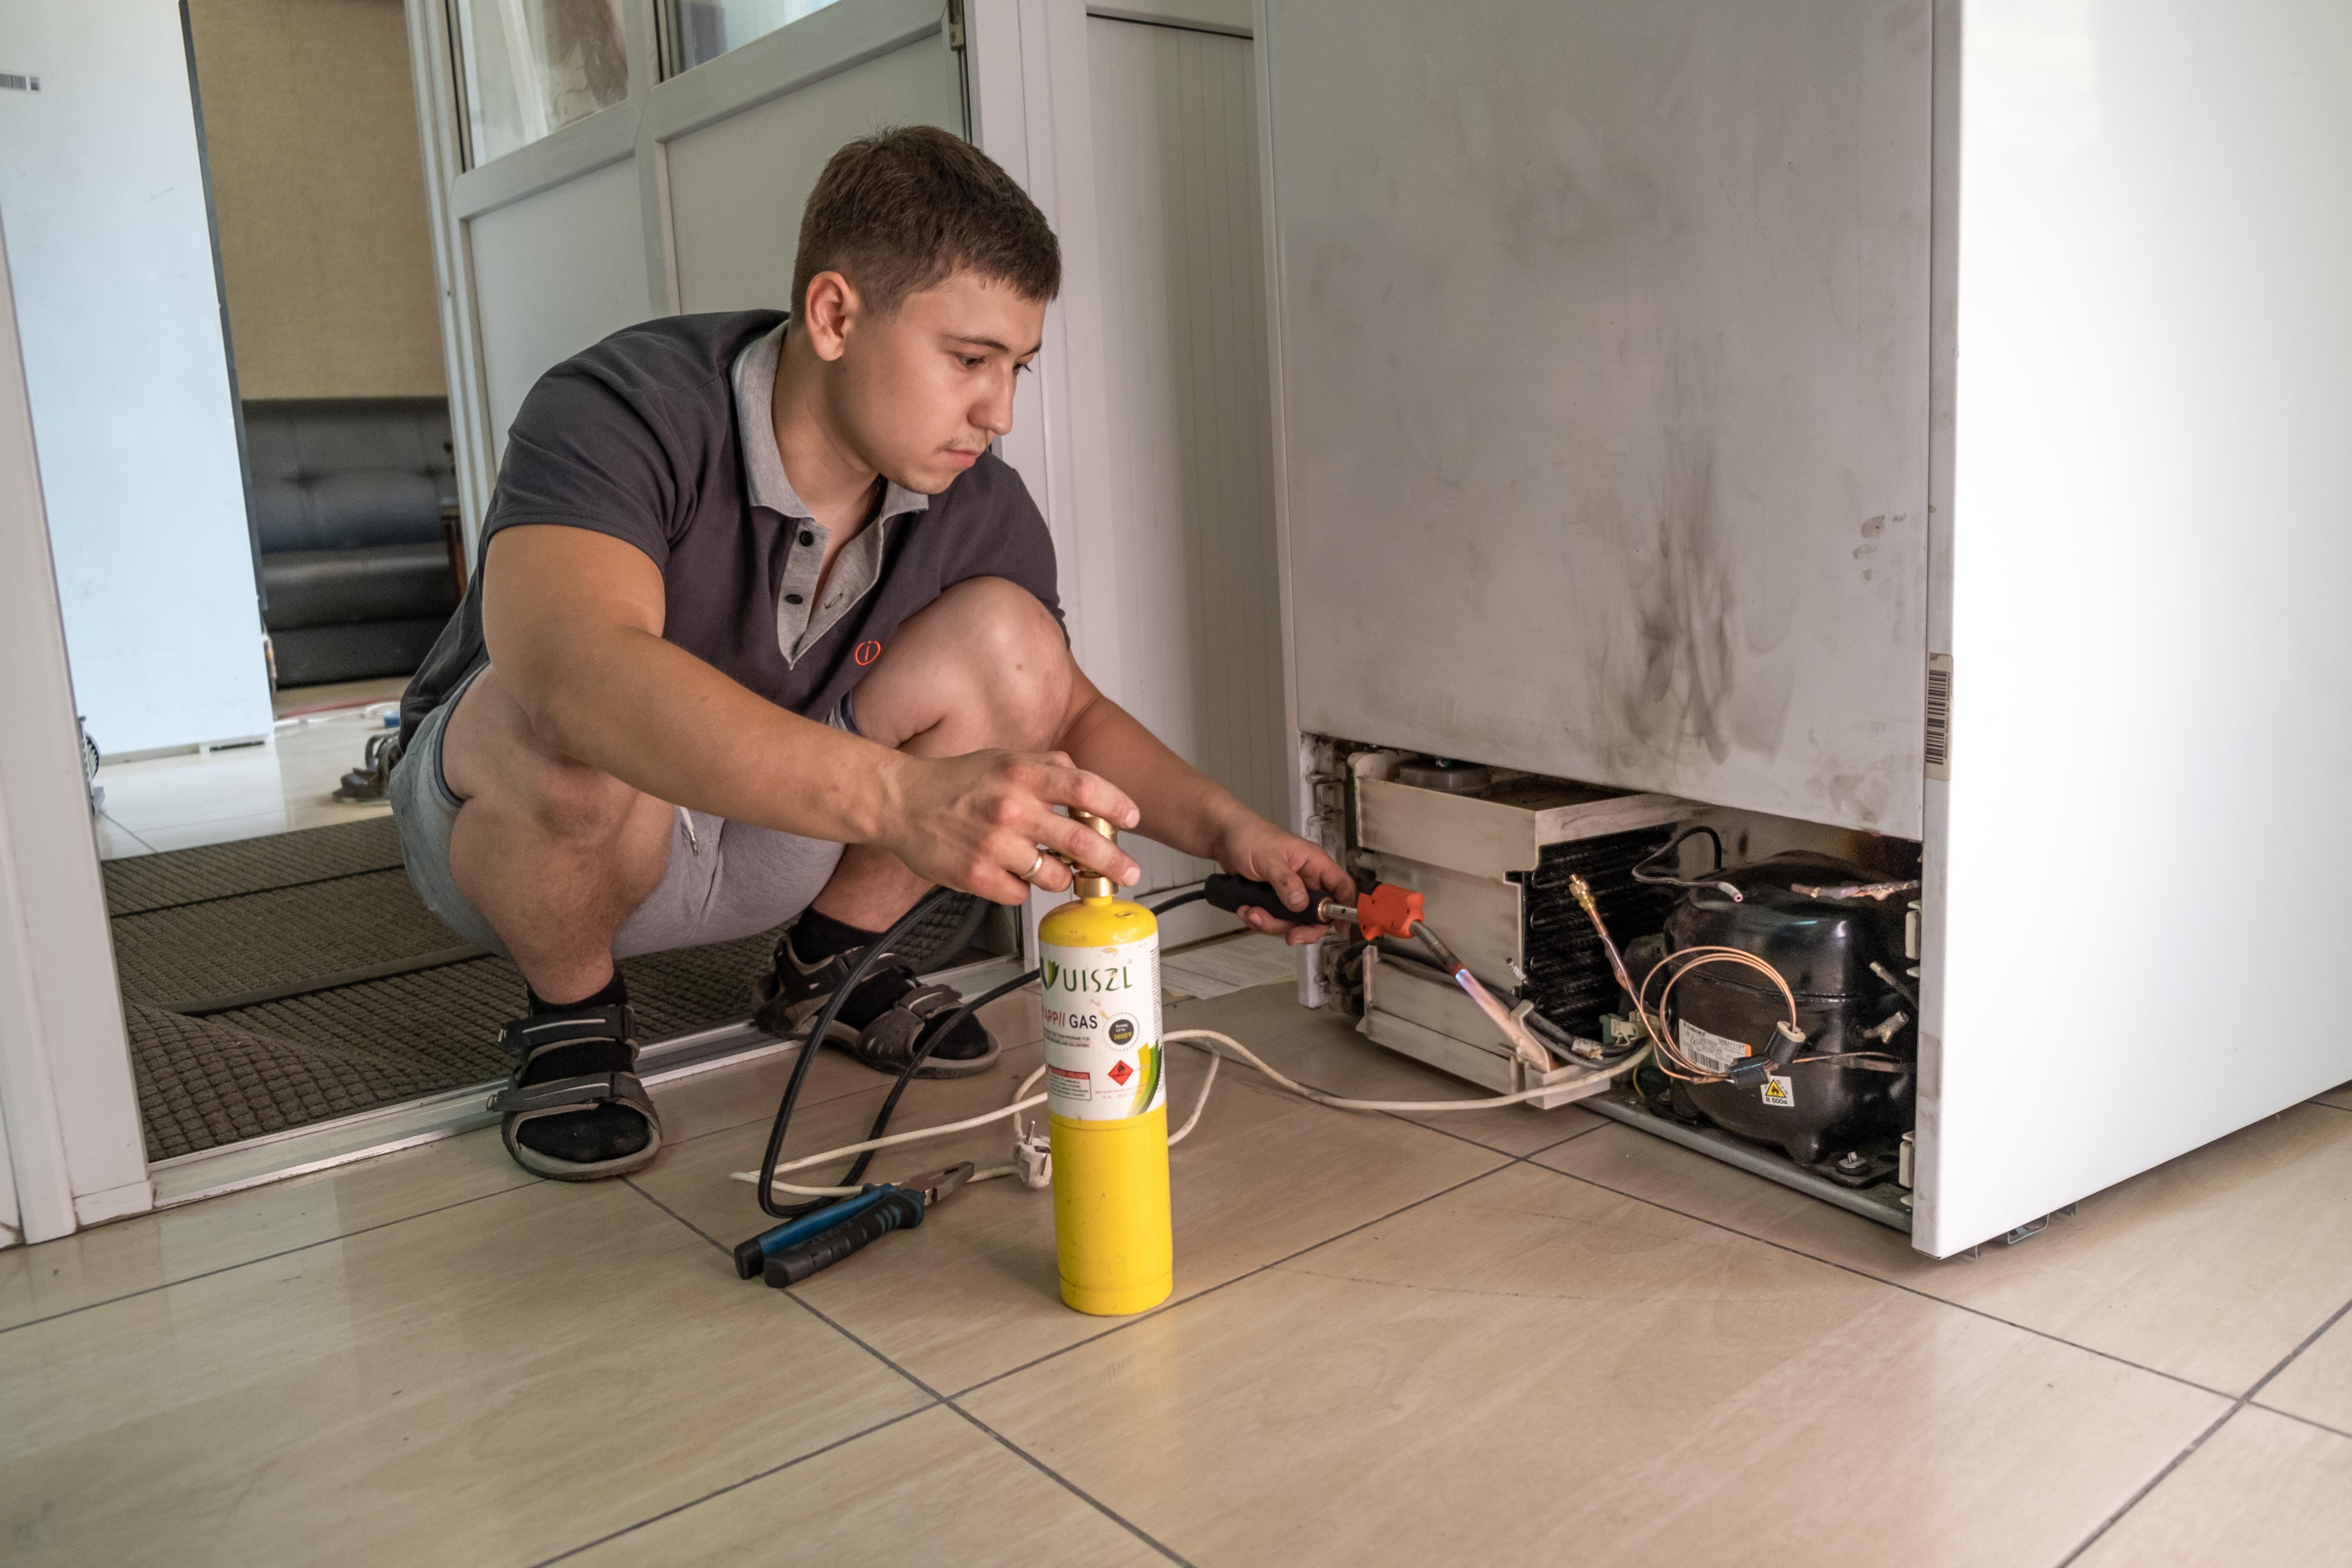 Произведем ремонт холодильника или шкафа для вина